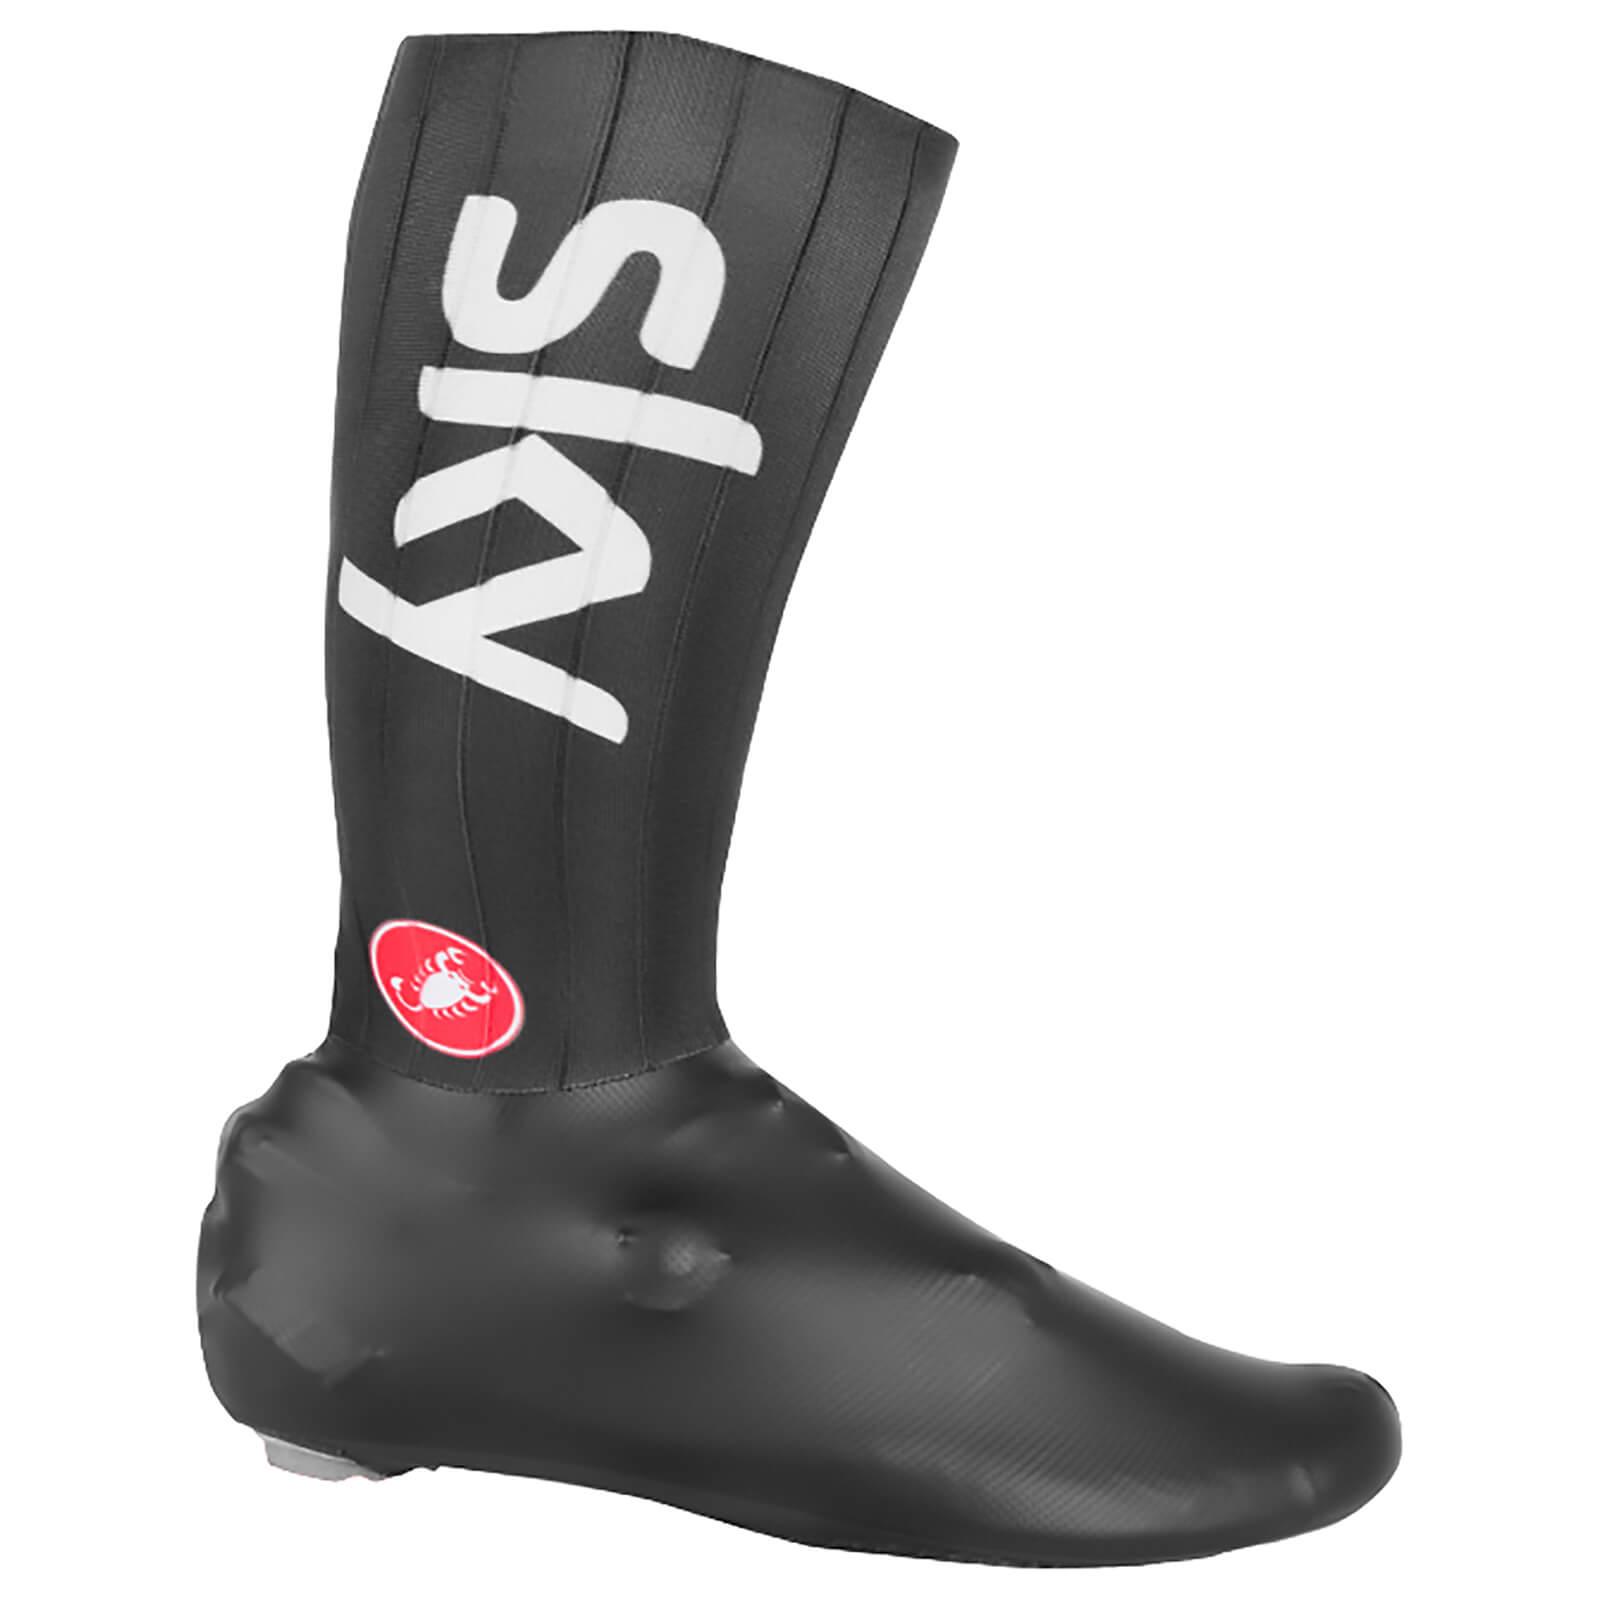 Castelli Team Sky Fast Feet TT Shoe Covers - Black - M